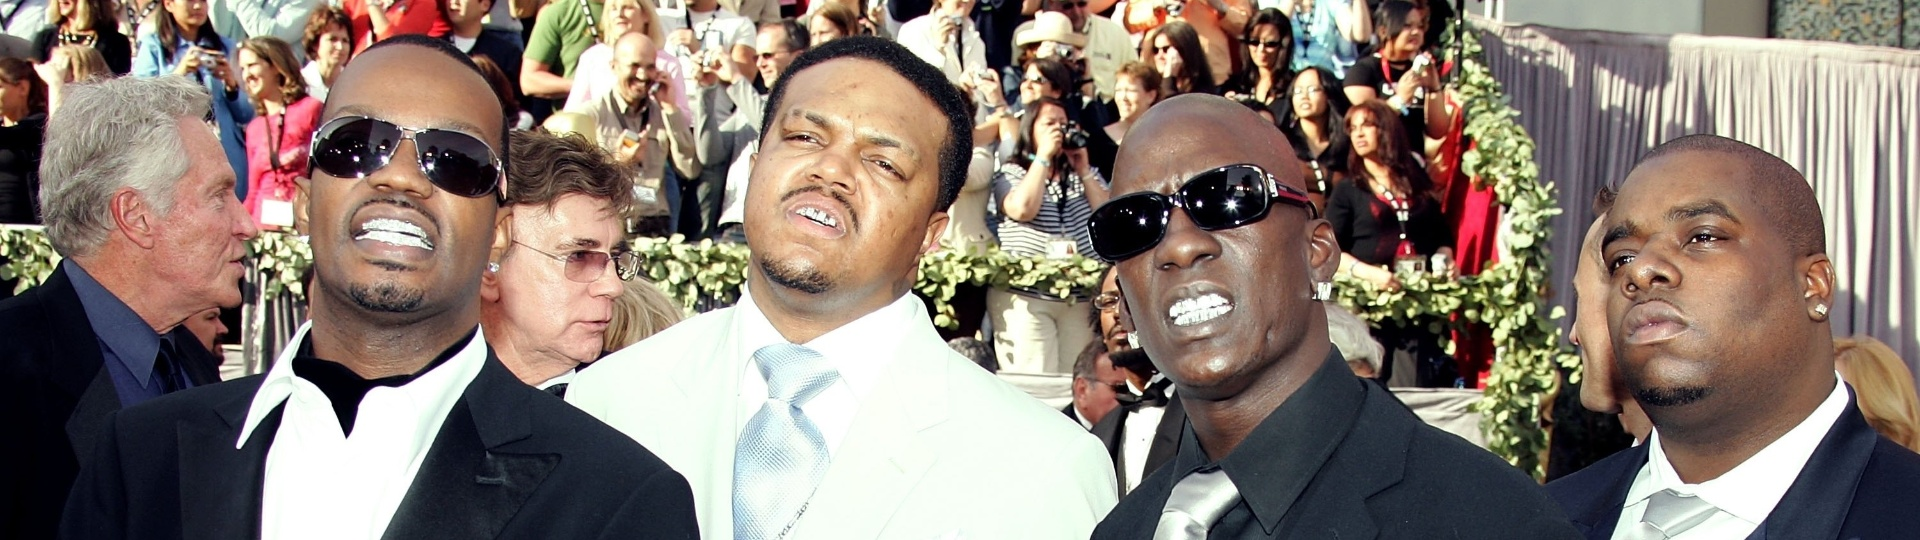 21.jan.2014 - O grupo de rap Three 6 Mafia recebeu Oscar pela música